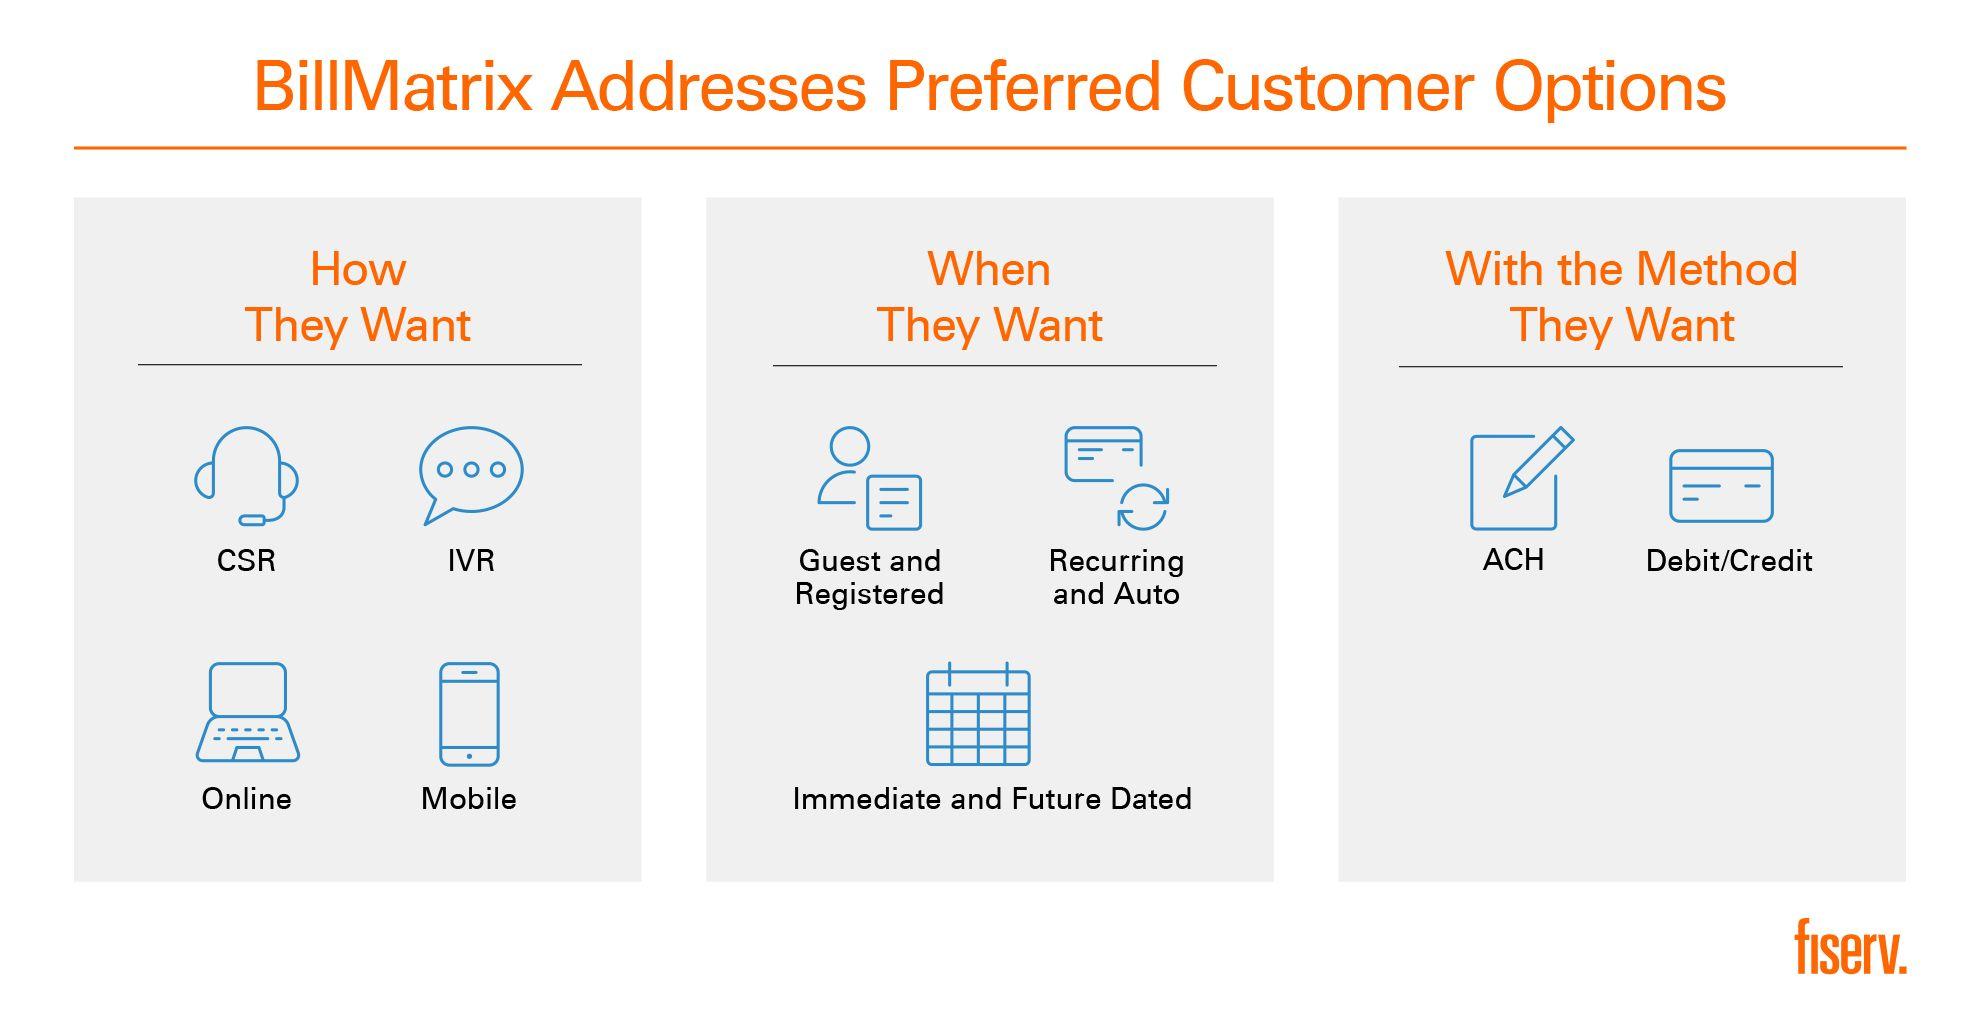 BillMatrix Addresses Preferred Customer Options